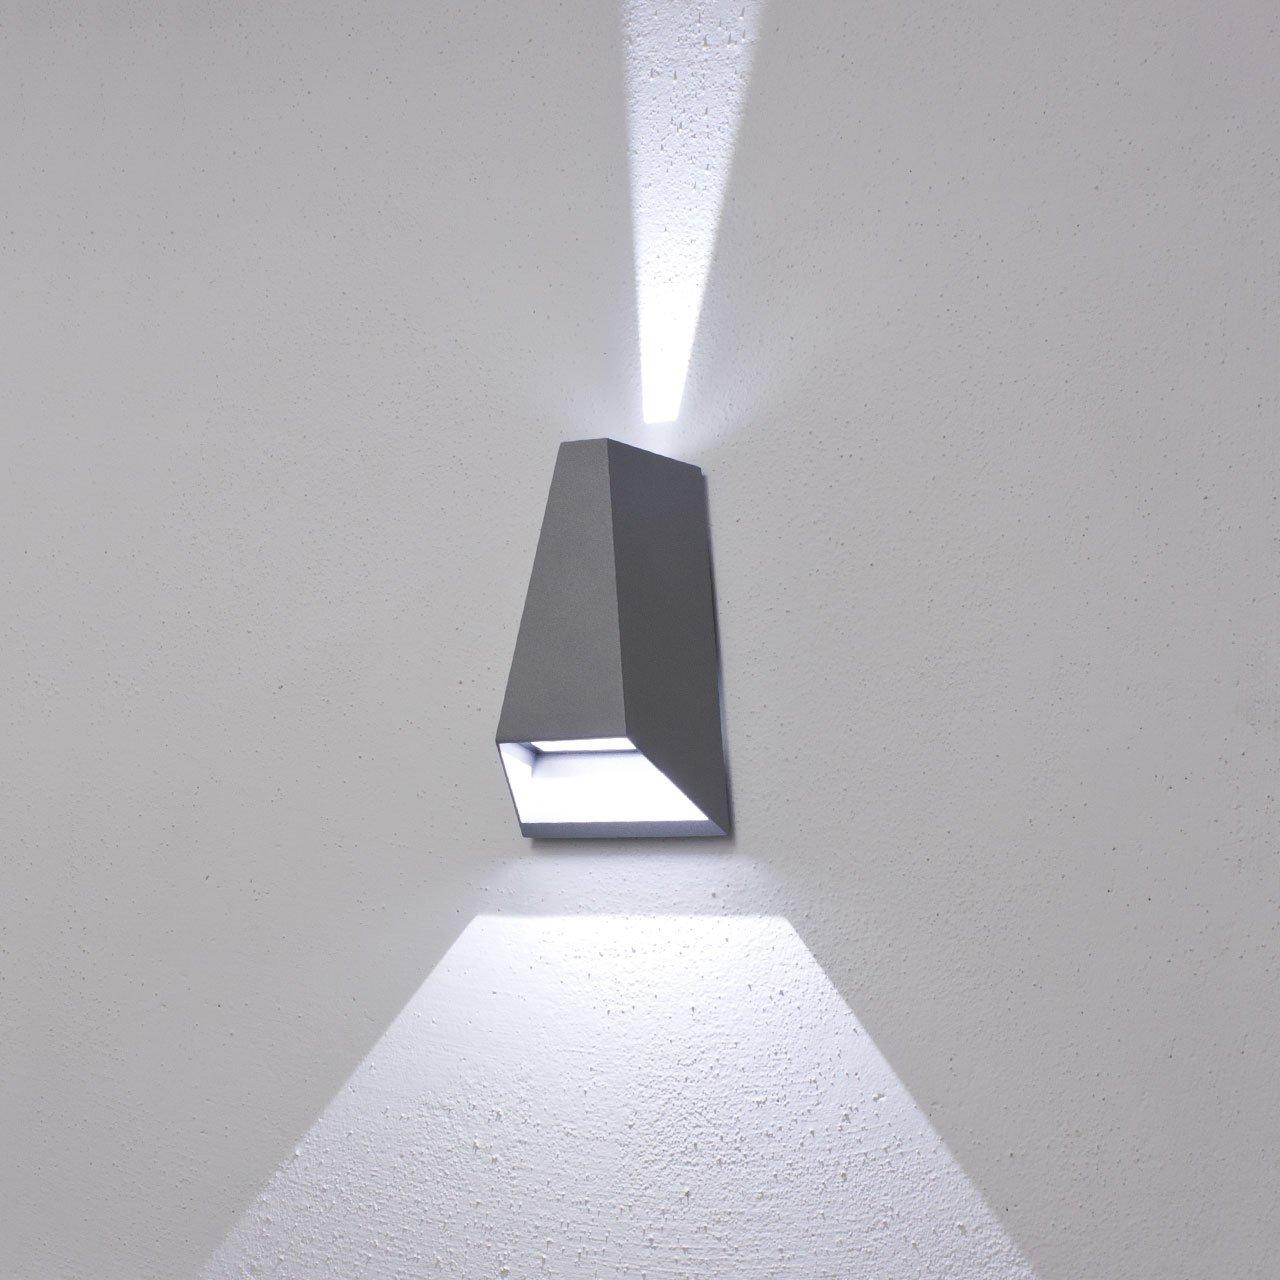 Applique esterno led oslo led applique per esterni with - Applique led esterno ...